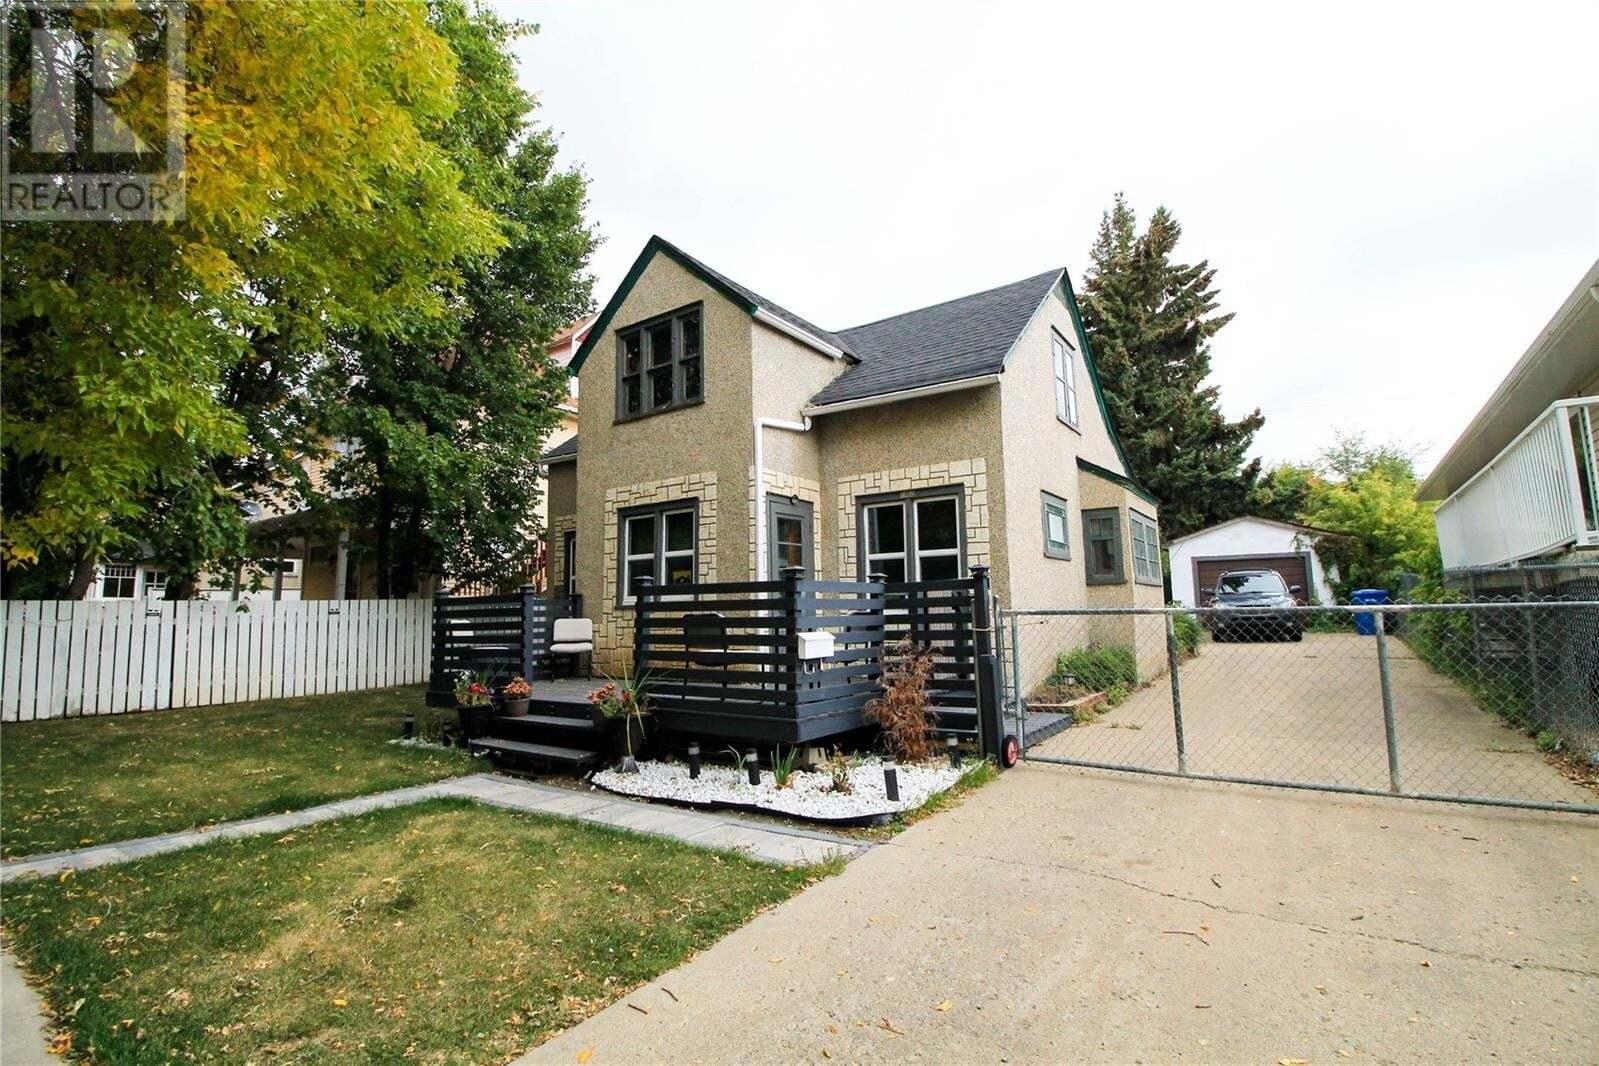 House for sale at 1062 104th St North Battleford Saskatchewan - MLS: SK828288